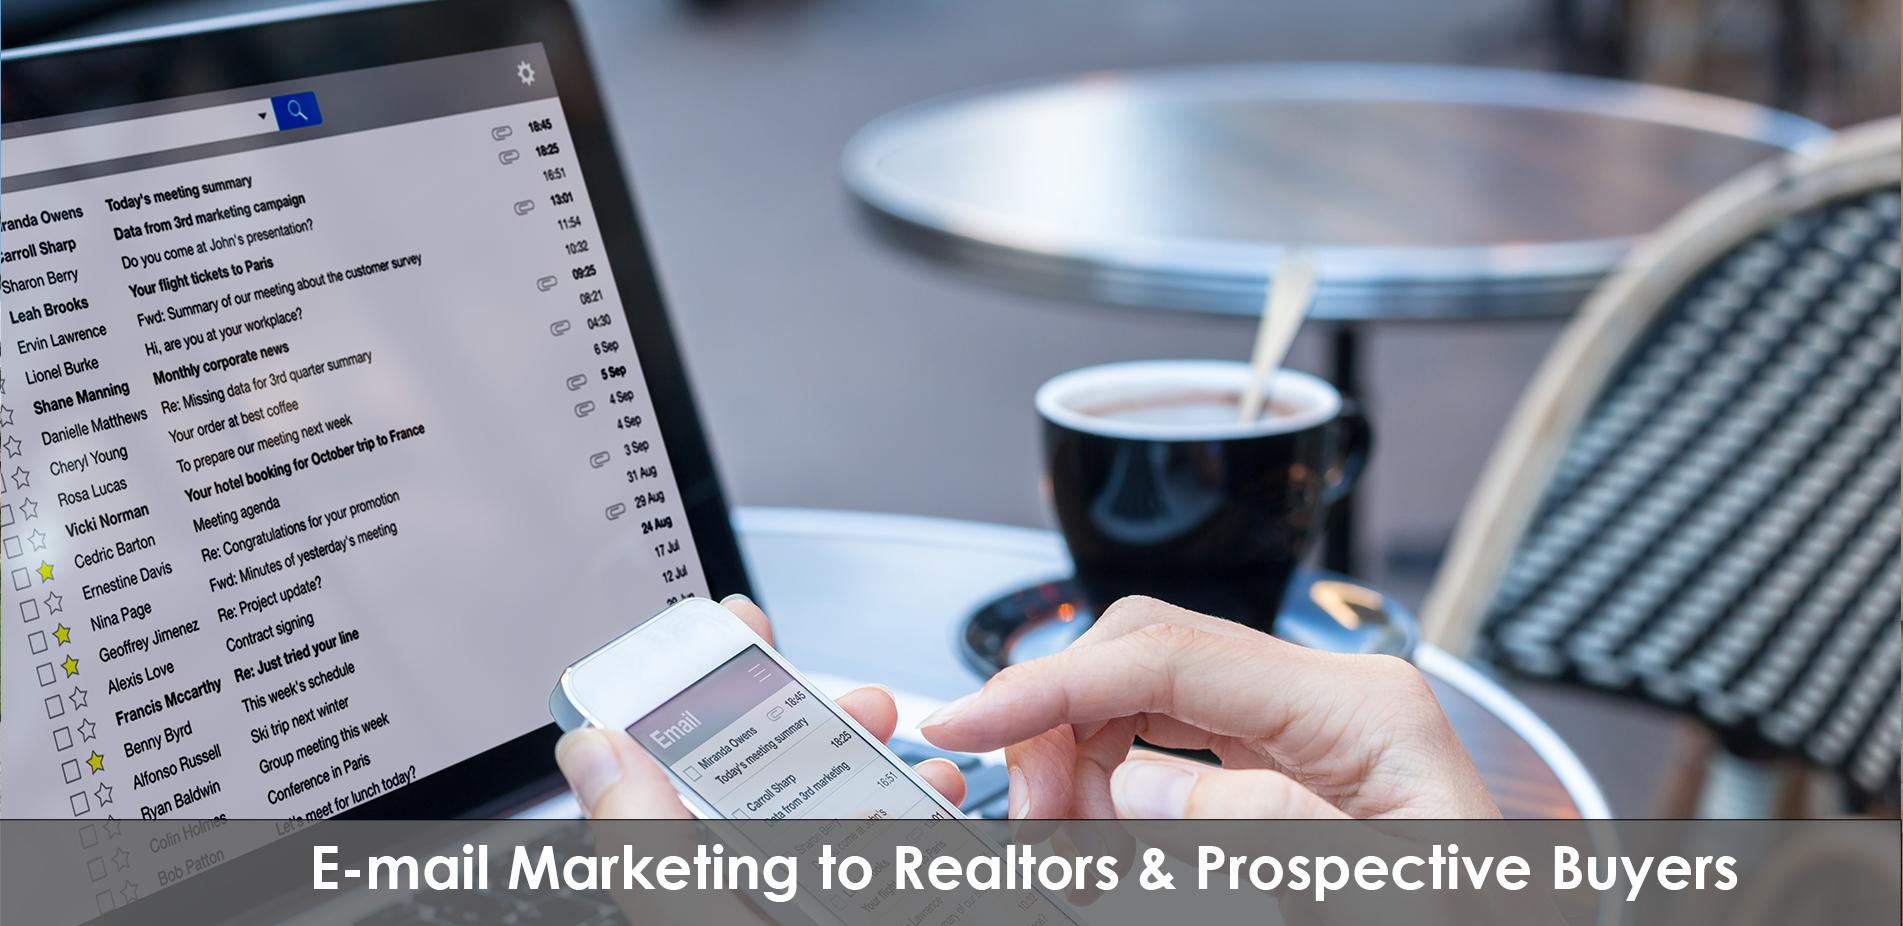 E-mail Marketing to Realtors & Prospective Buyers.jpg